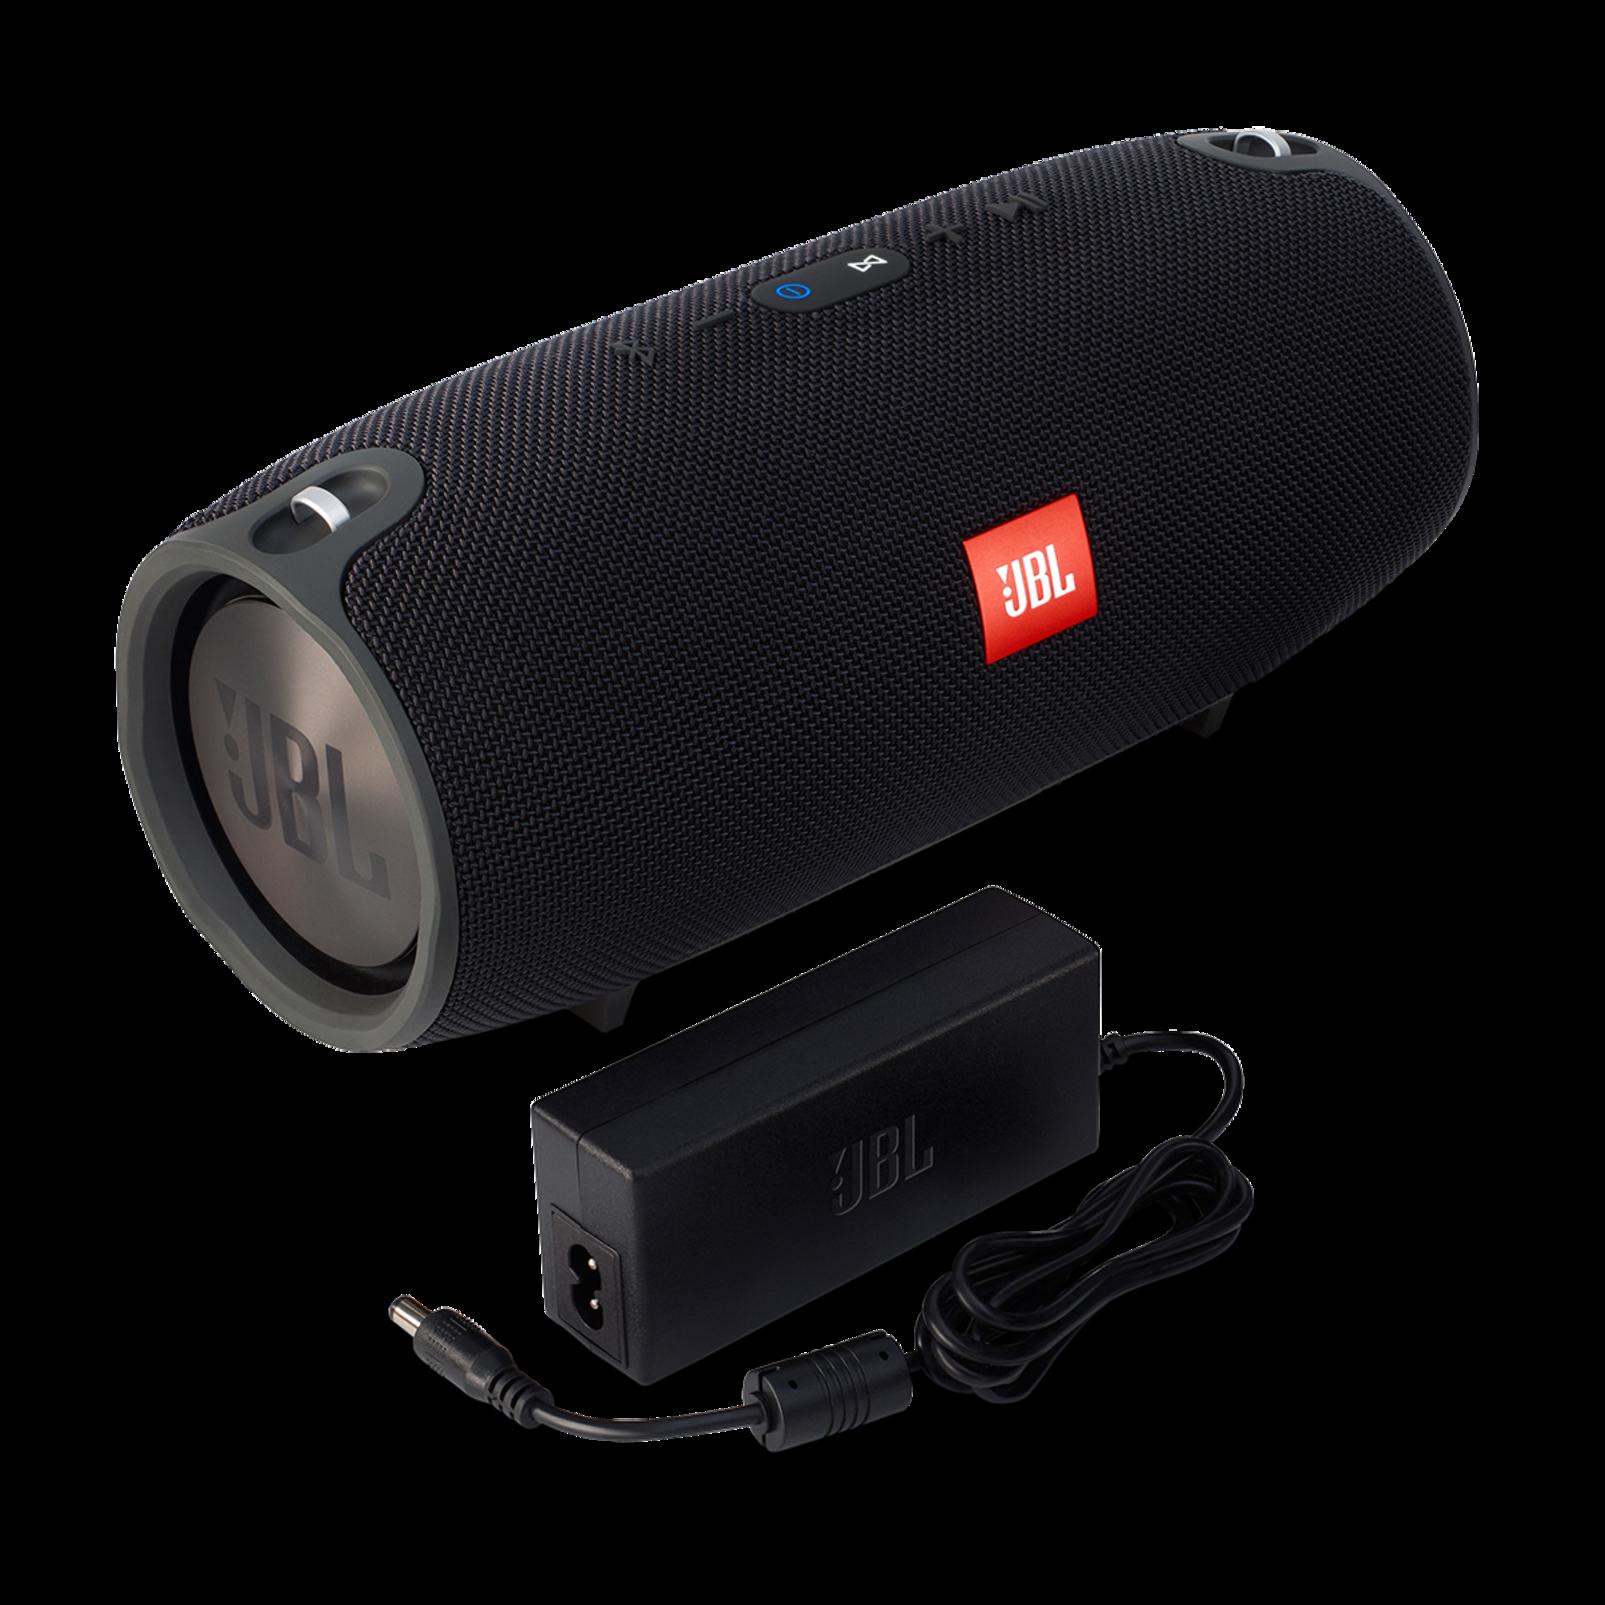 JBL Xtreme - Black - Splashproof portable speaker with ultra-powerful performance - Detailshot 1